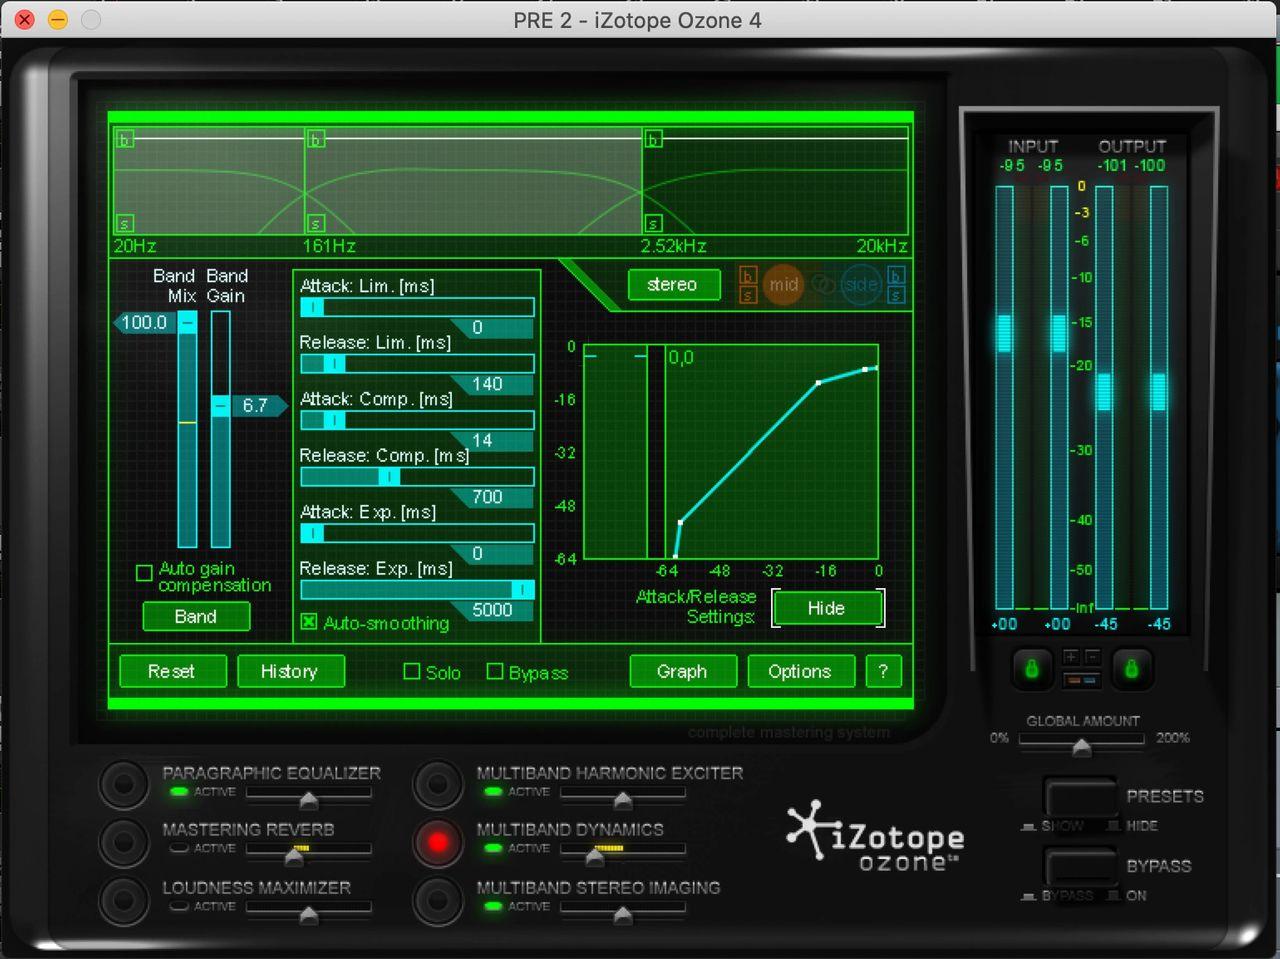 Jaycen Joshua iZotope Ozone 4 Mixing Presets | Mix Bus Chain